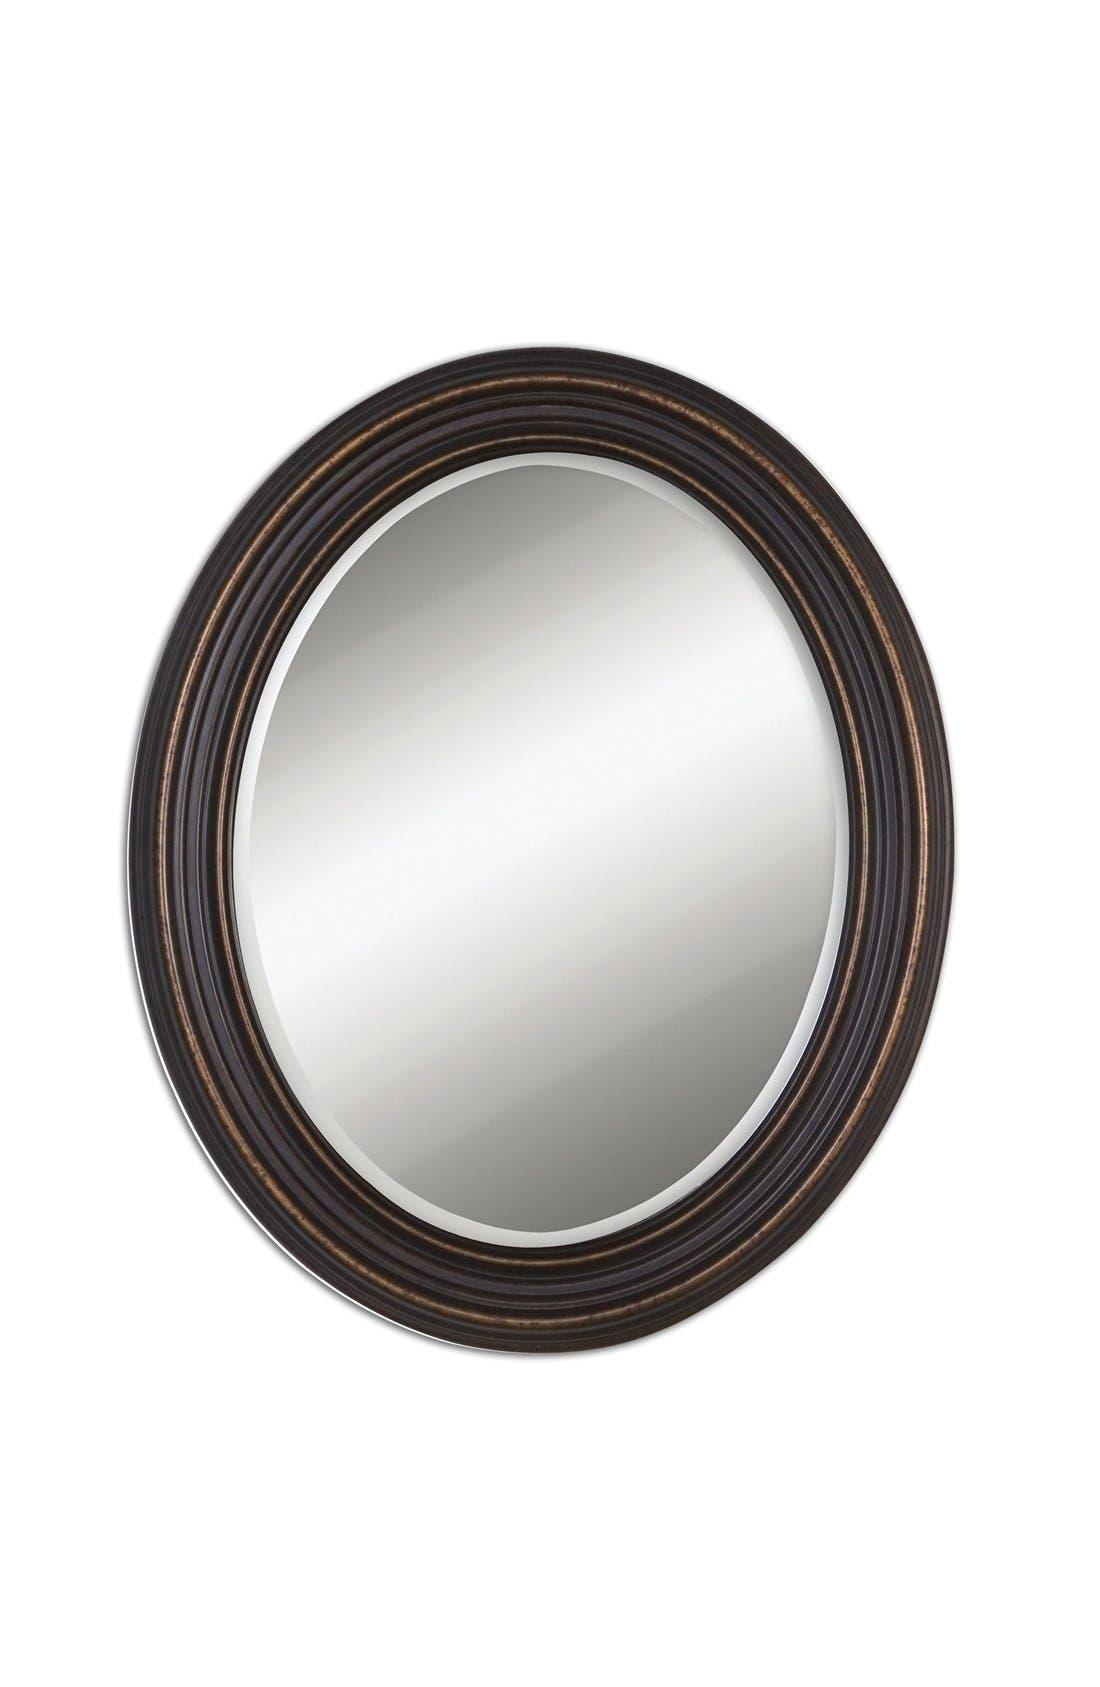 'Ovesca' Oval Mirror,                             Main thumbnail 1, color,                             001